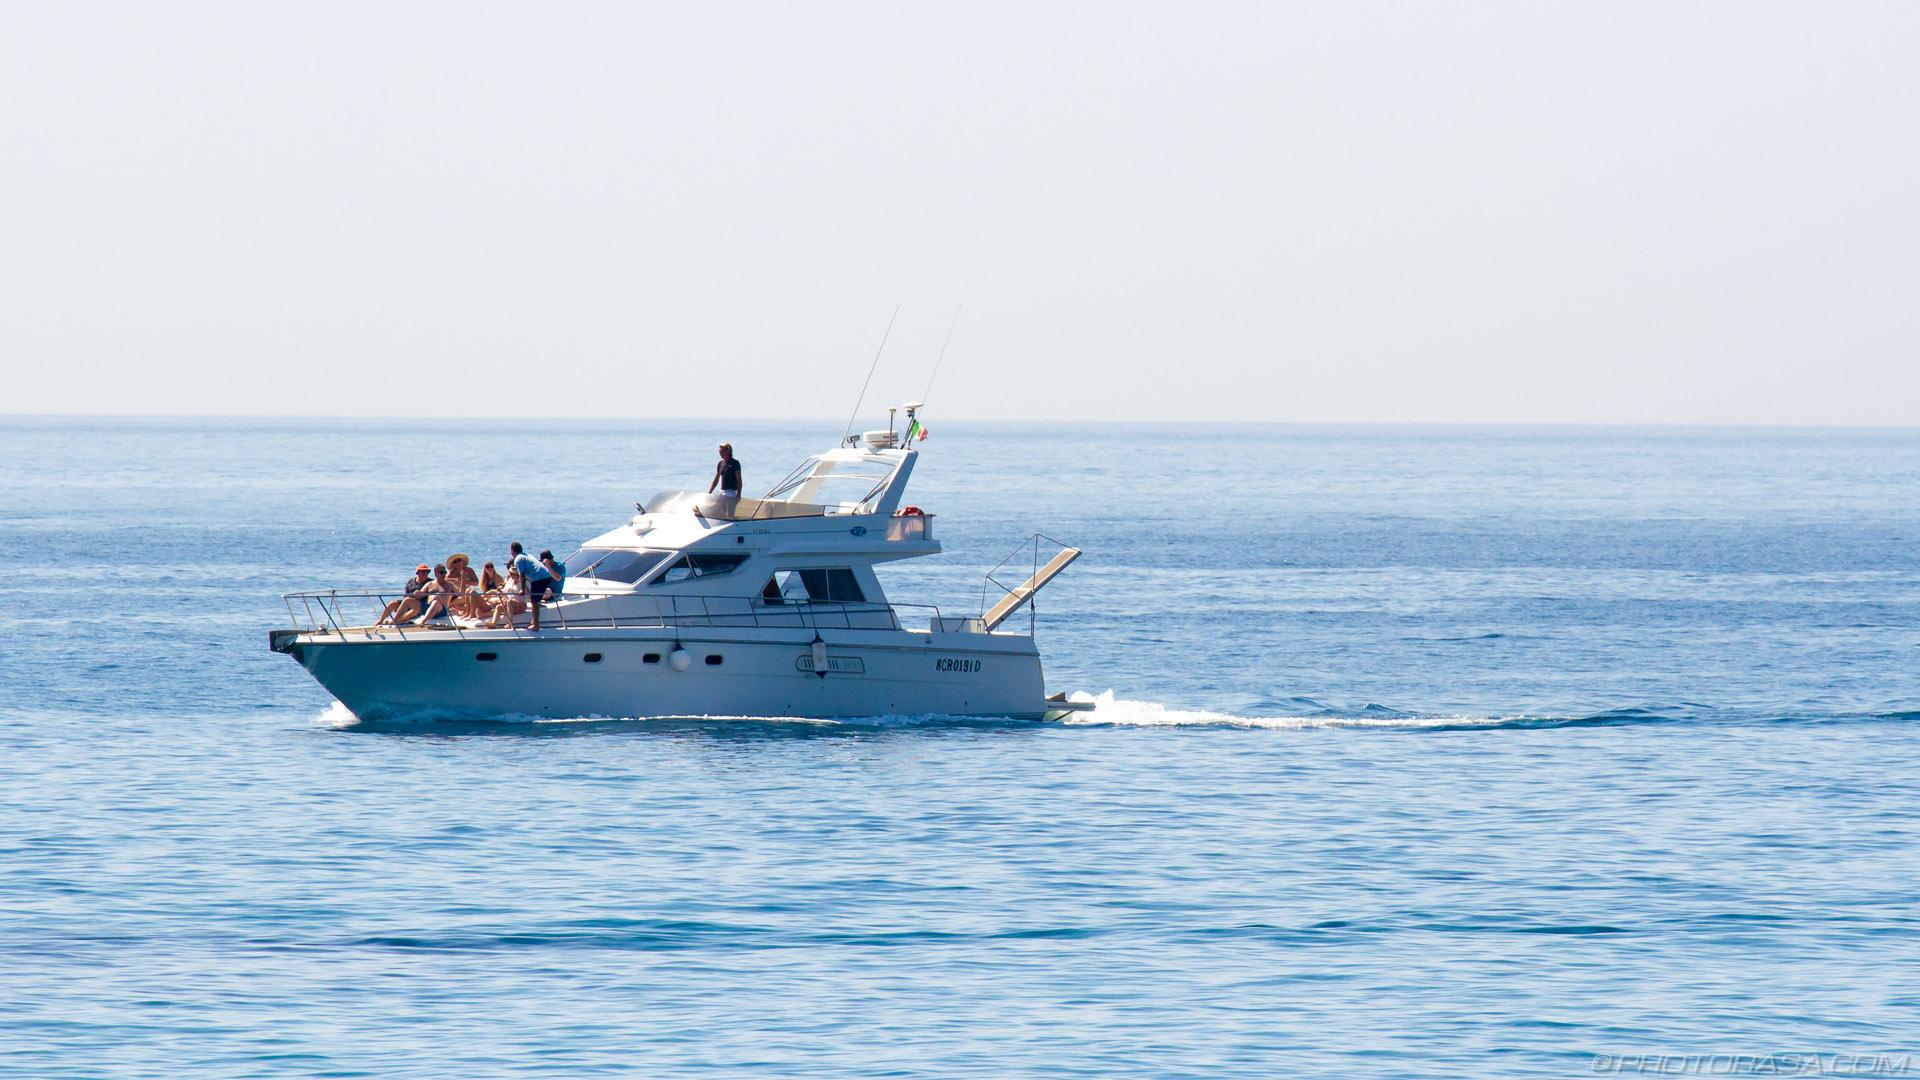 https://photorasa.com/giardini-naxos/speeding-yacht-full-of-people/